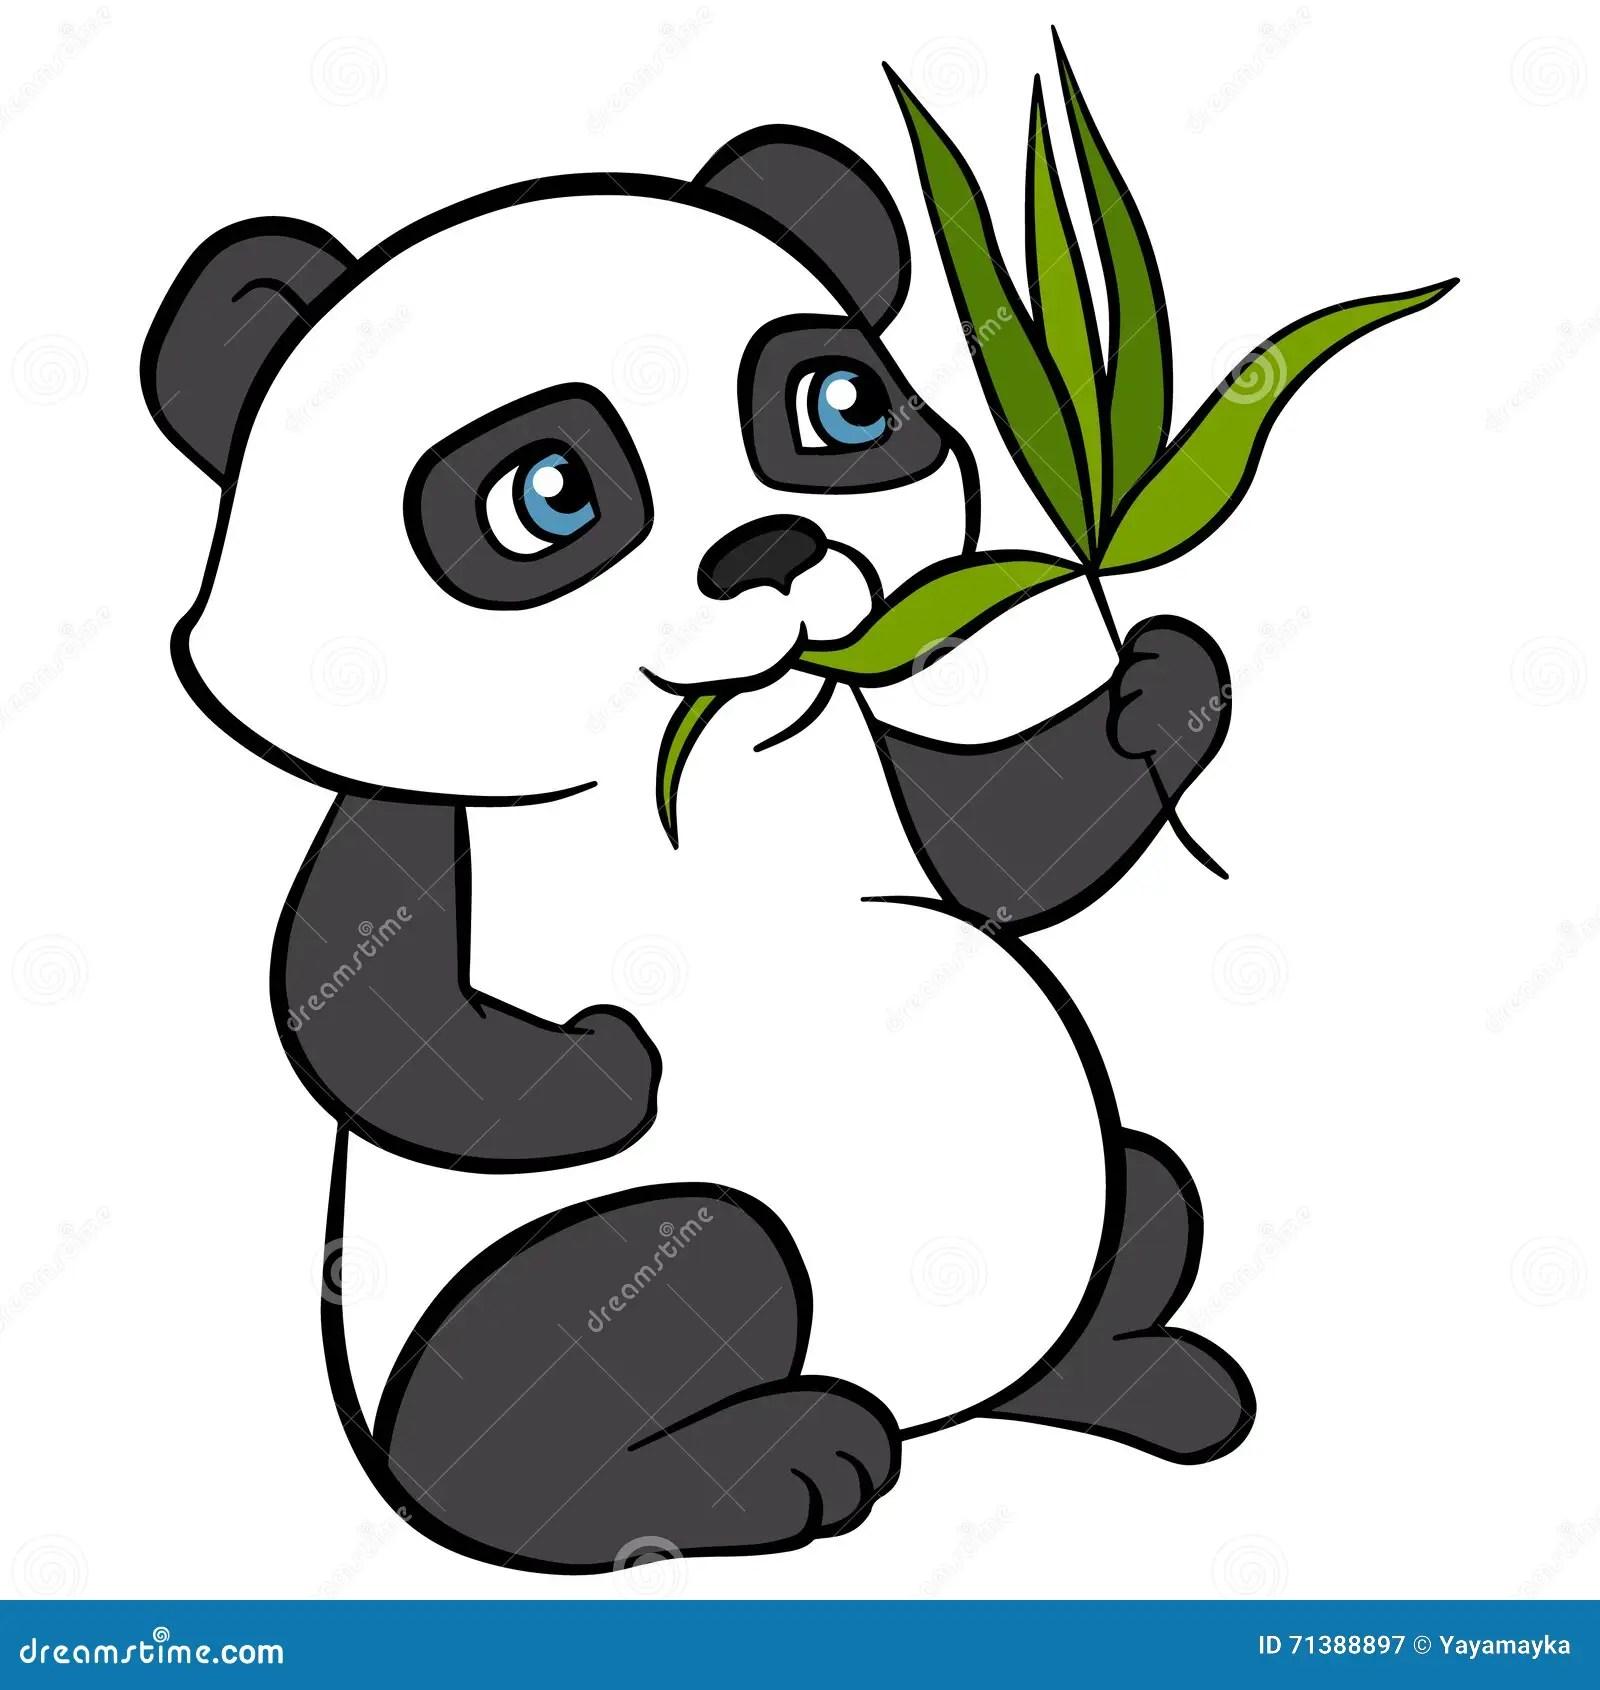 Cartoon Animals For Kids Little Cute Panda Eat Leaves Stock Vector Illustration Of Baby Leaves 71388897